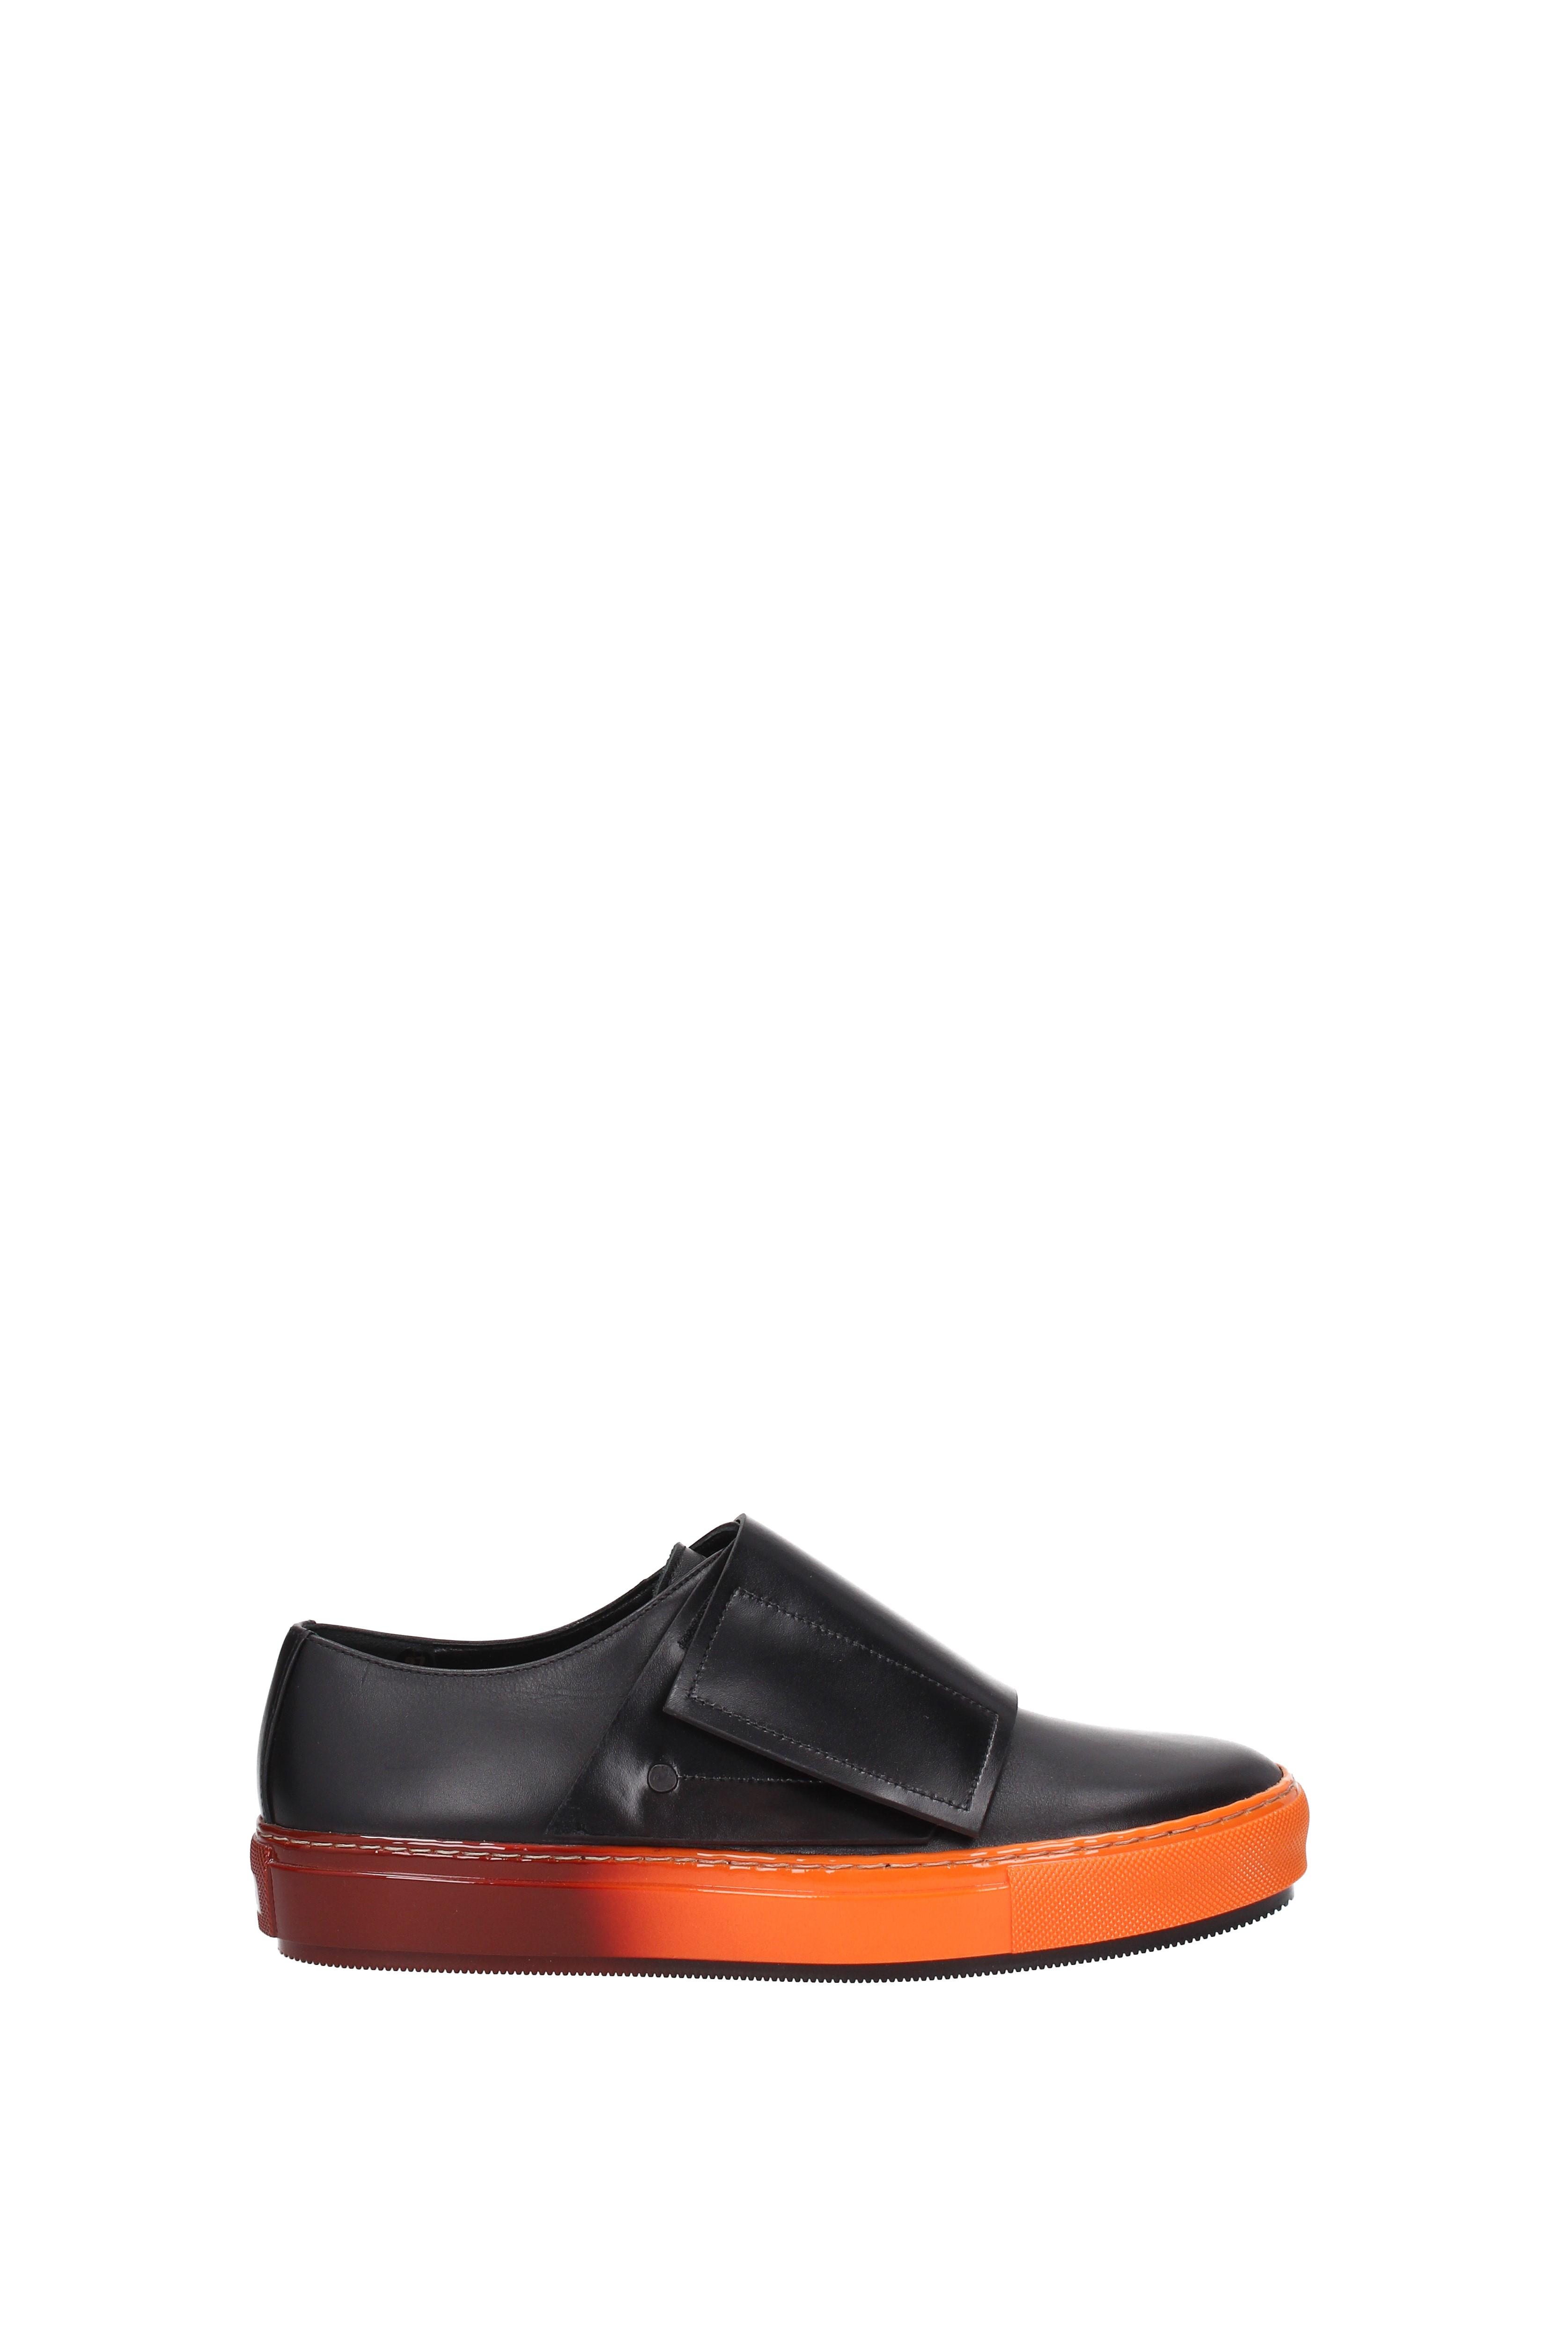 Sneakers Marni Damen - Leder (SNZWW01G03LV691)